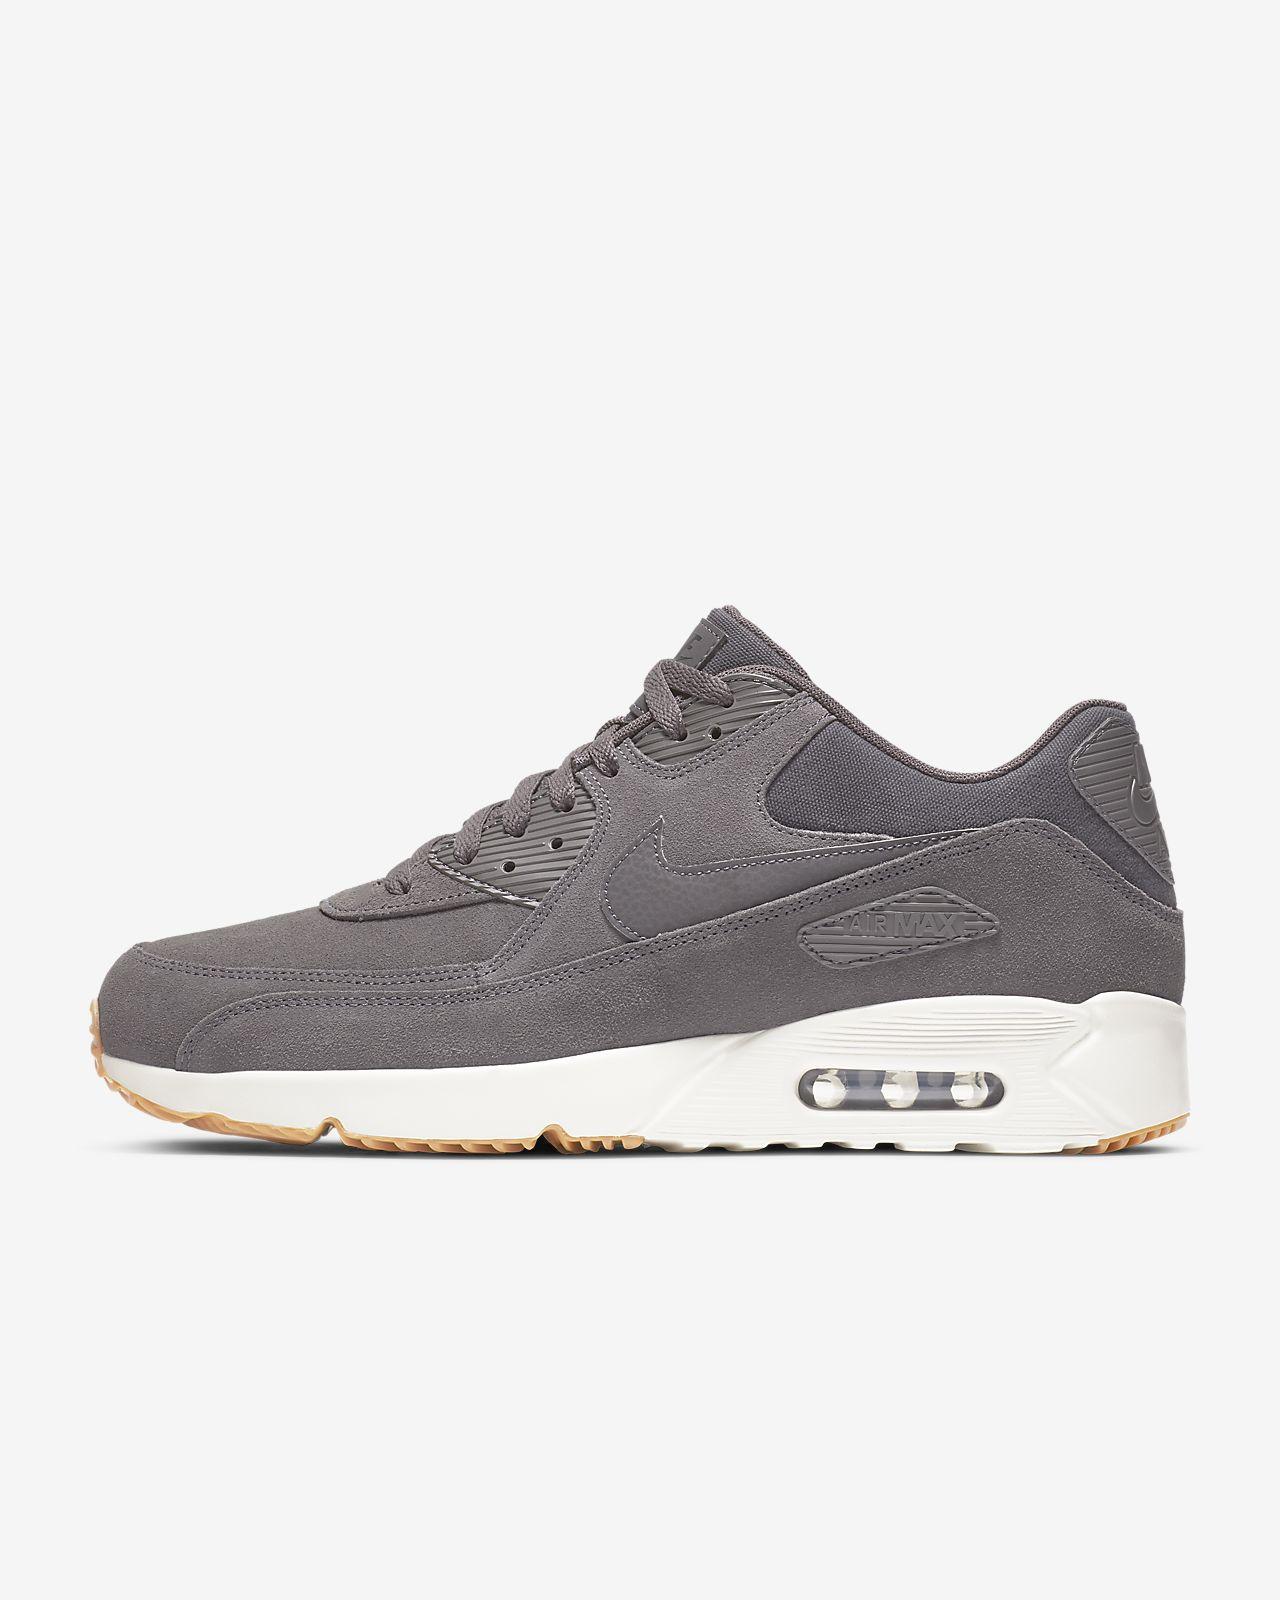 sports shoes 2f28c 18187 ... Scarpa Nike Air Max 90 Ultra 2.0 - Uomo